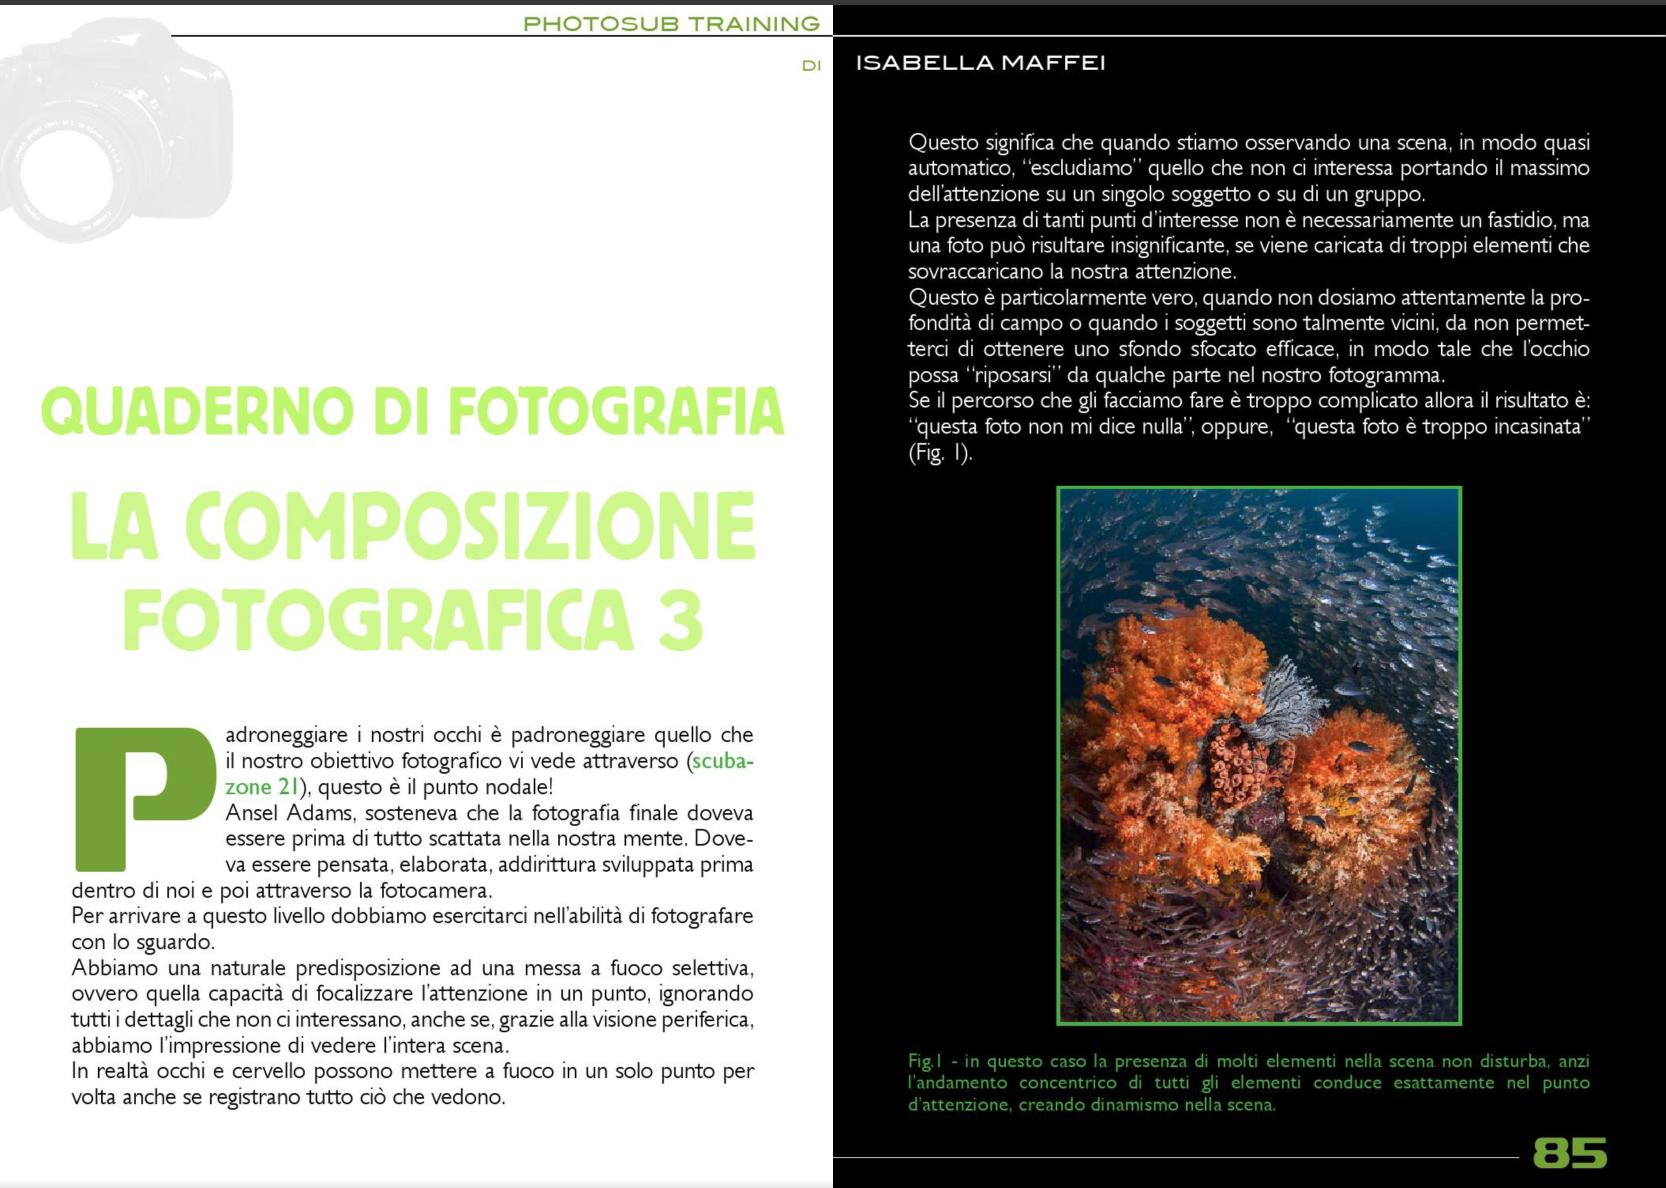 Photosub training by Isabella Maffei